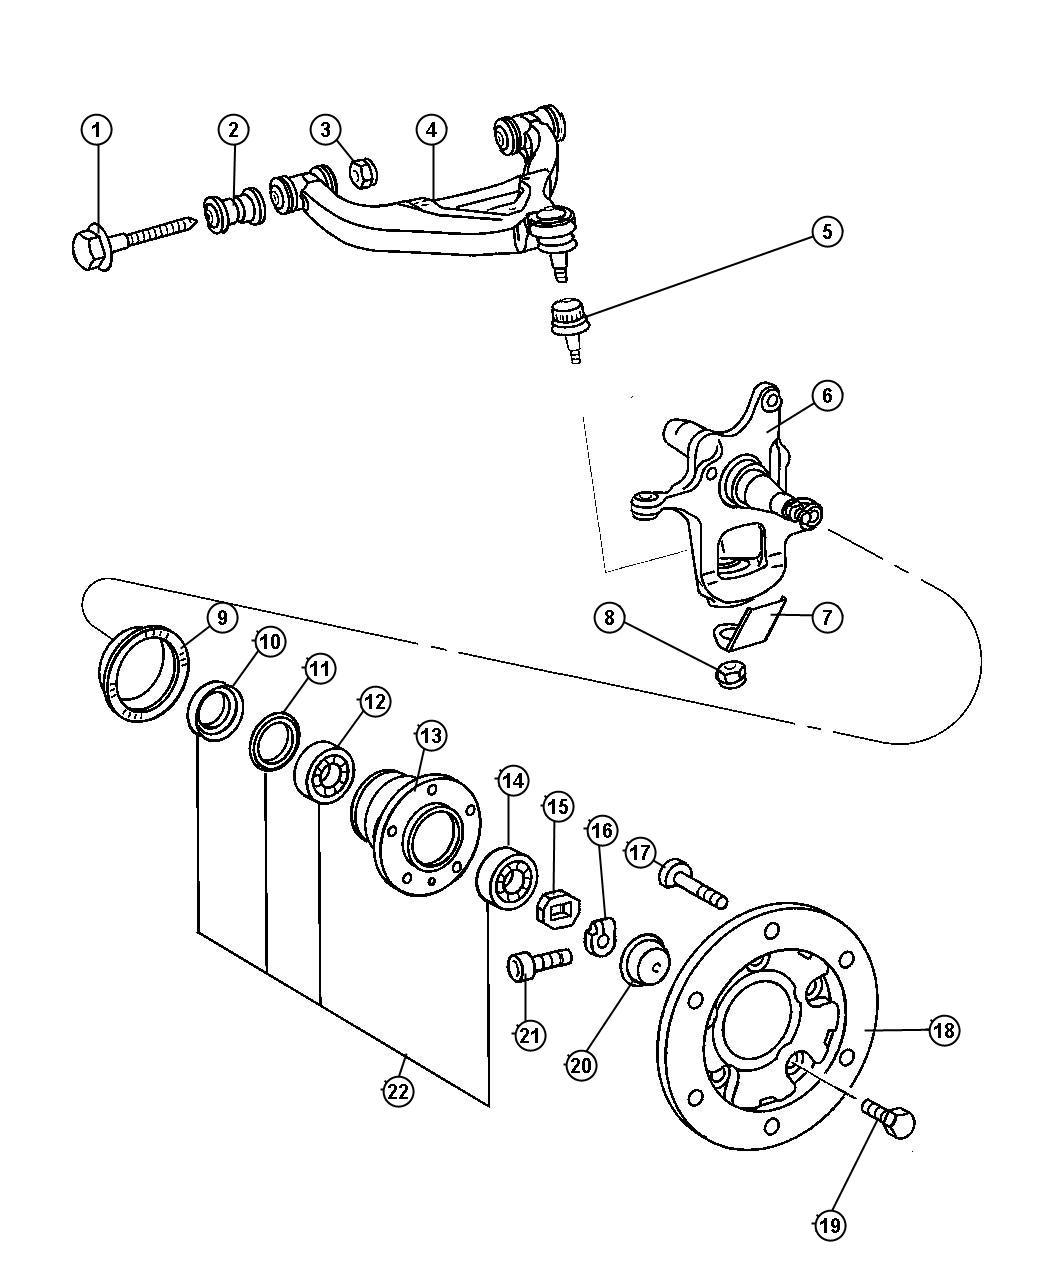 tags: #2003 chevy impala parts diagram#2003 chevy suburban engine diagram#2003  chevy silverado parts diagram#2004 tahoe parts diagram#2002 chevy silverado